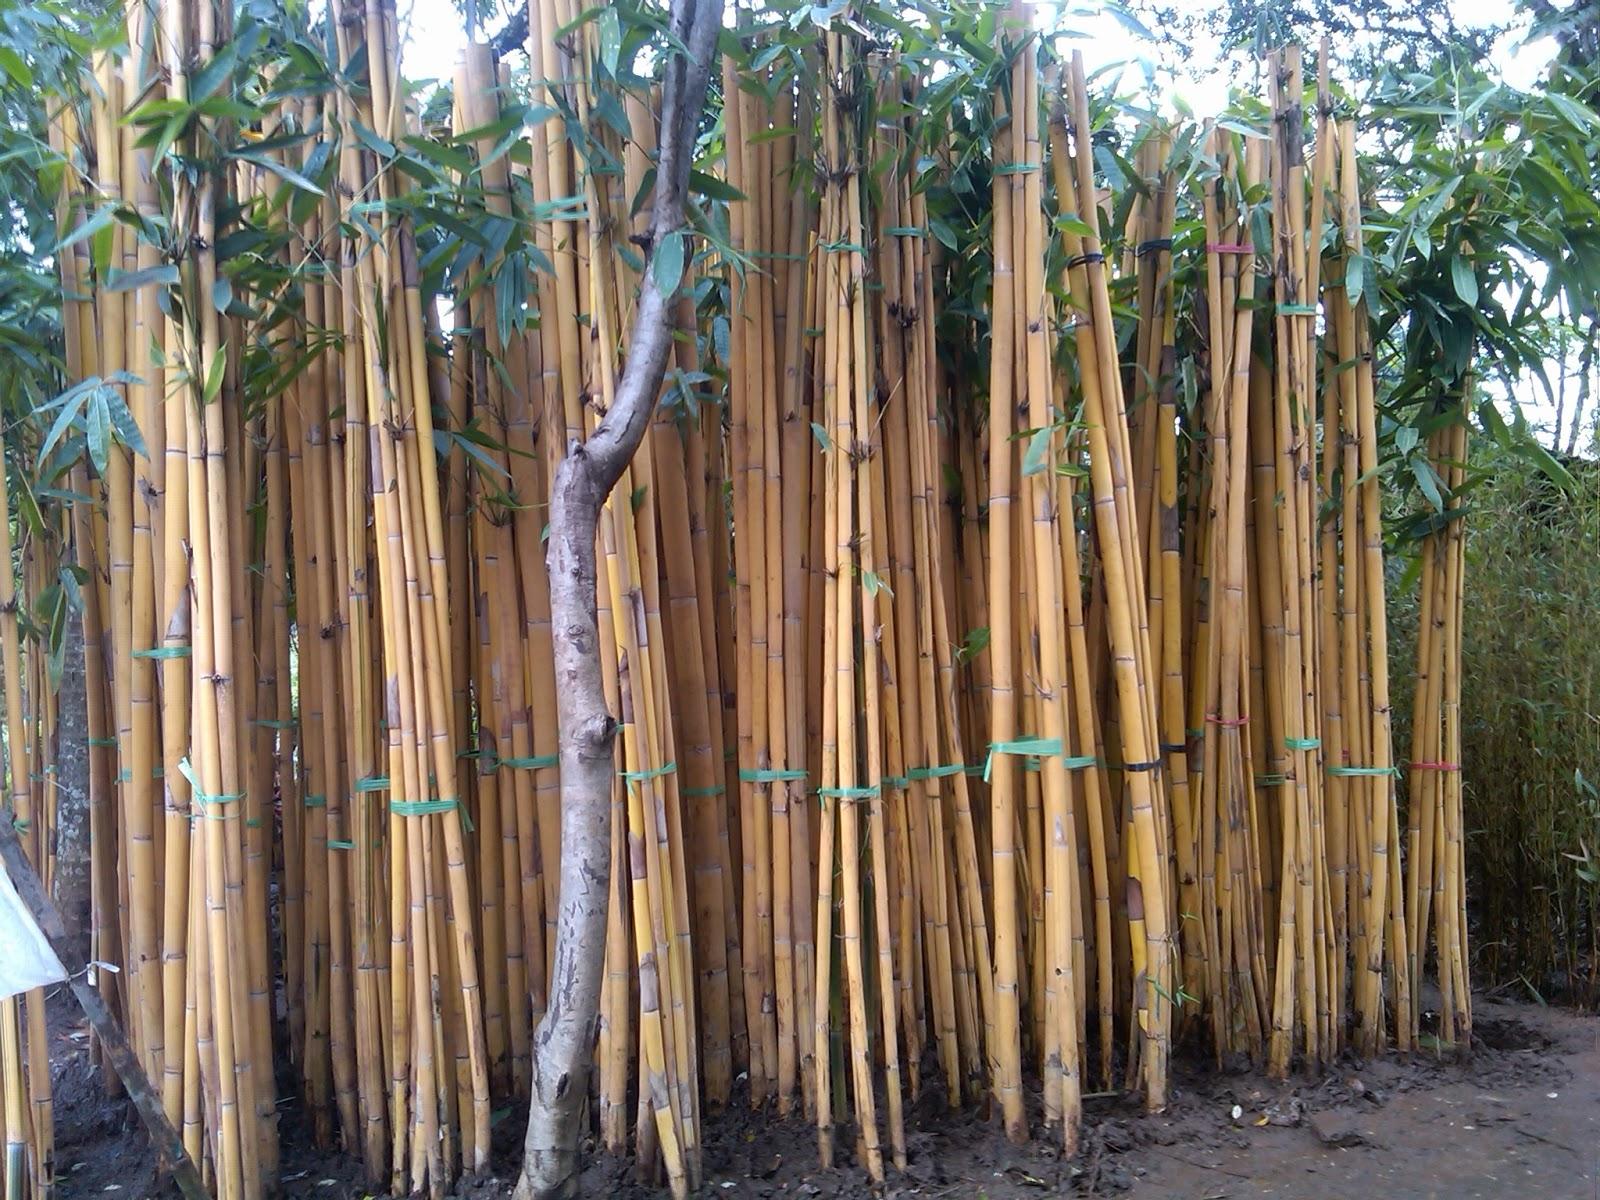 Jual Jual Pohon Bambu Jepang Dan Bambu Kuning Murah